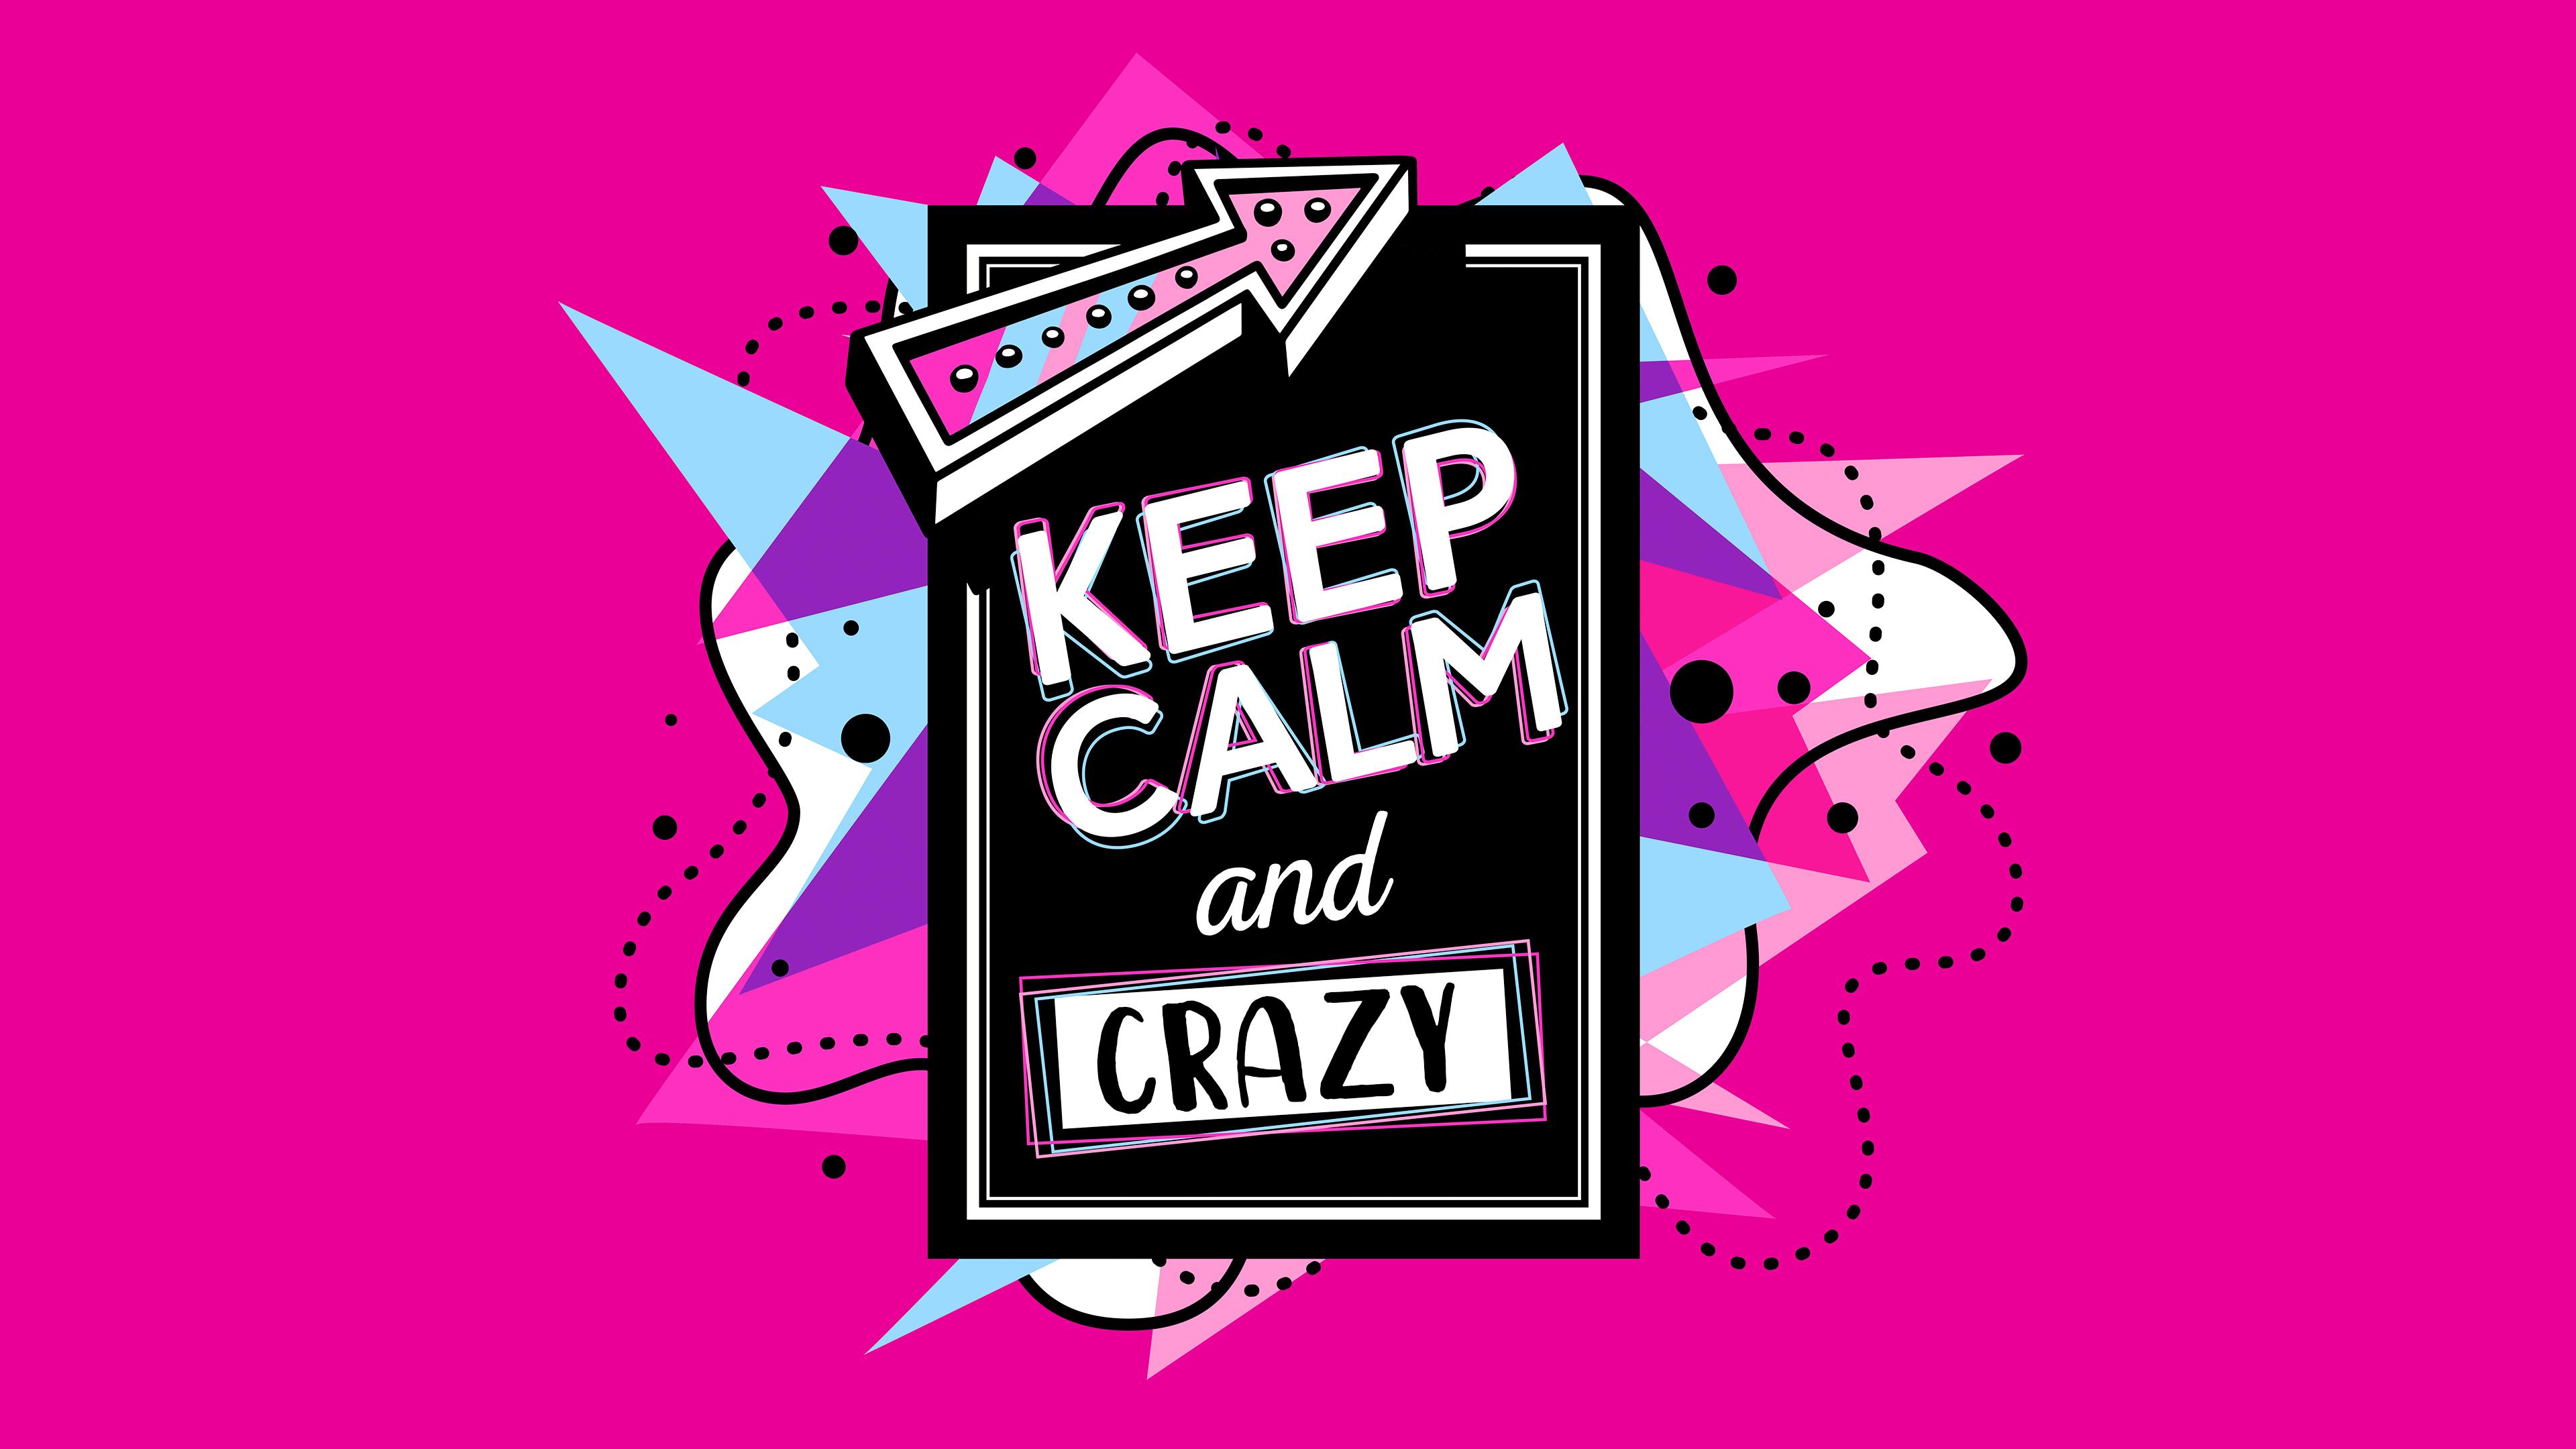 4K Keep Calm And Crazy Wallpaper HD 3840x2160